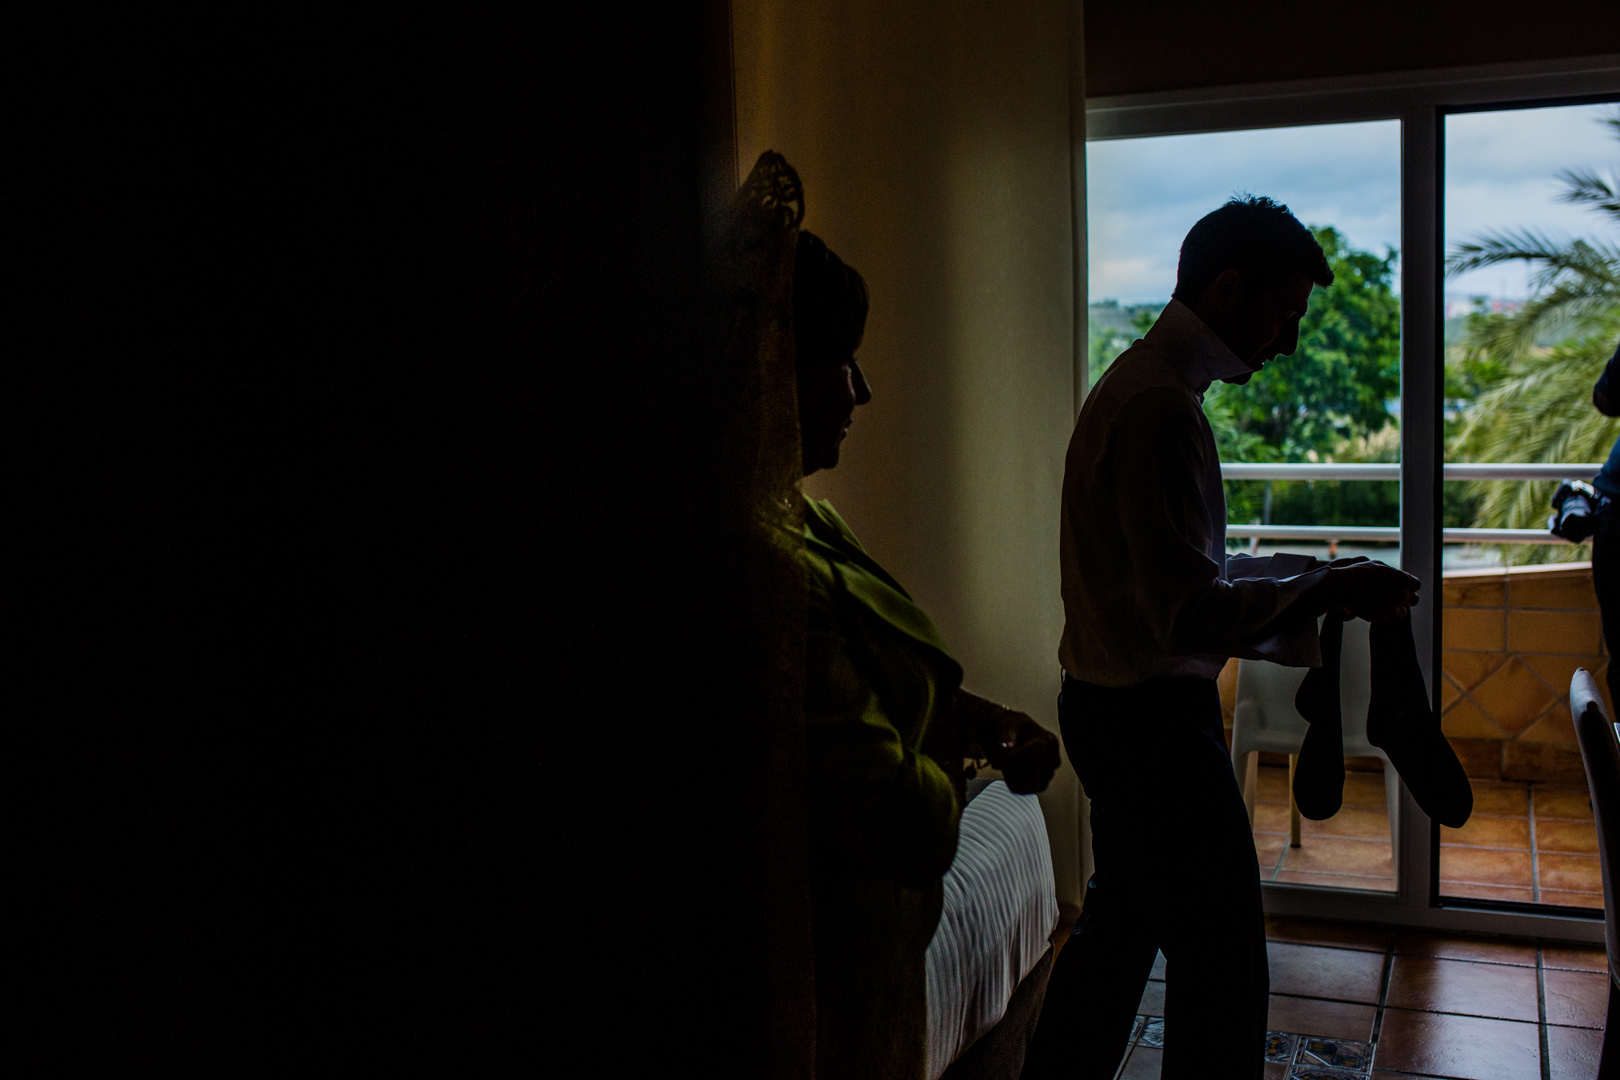 Boda-Catedral-Jaen-Hamburgo-Maria-David-engagement-Rafael-Torres-fotografo-bodas-sevilla-madrid-barcelona-wedding-photographer--4.jpg